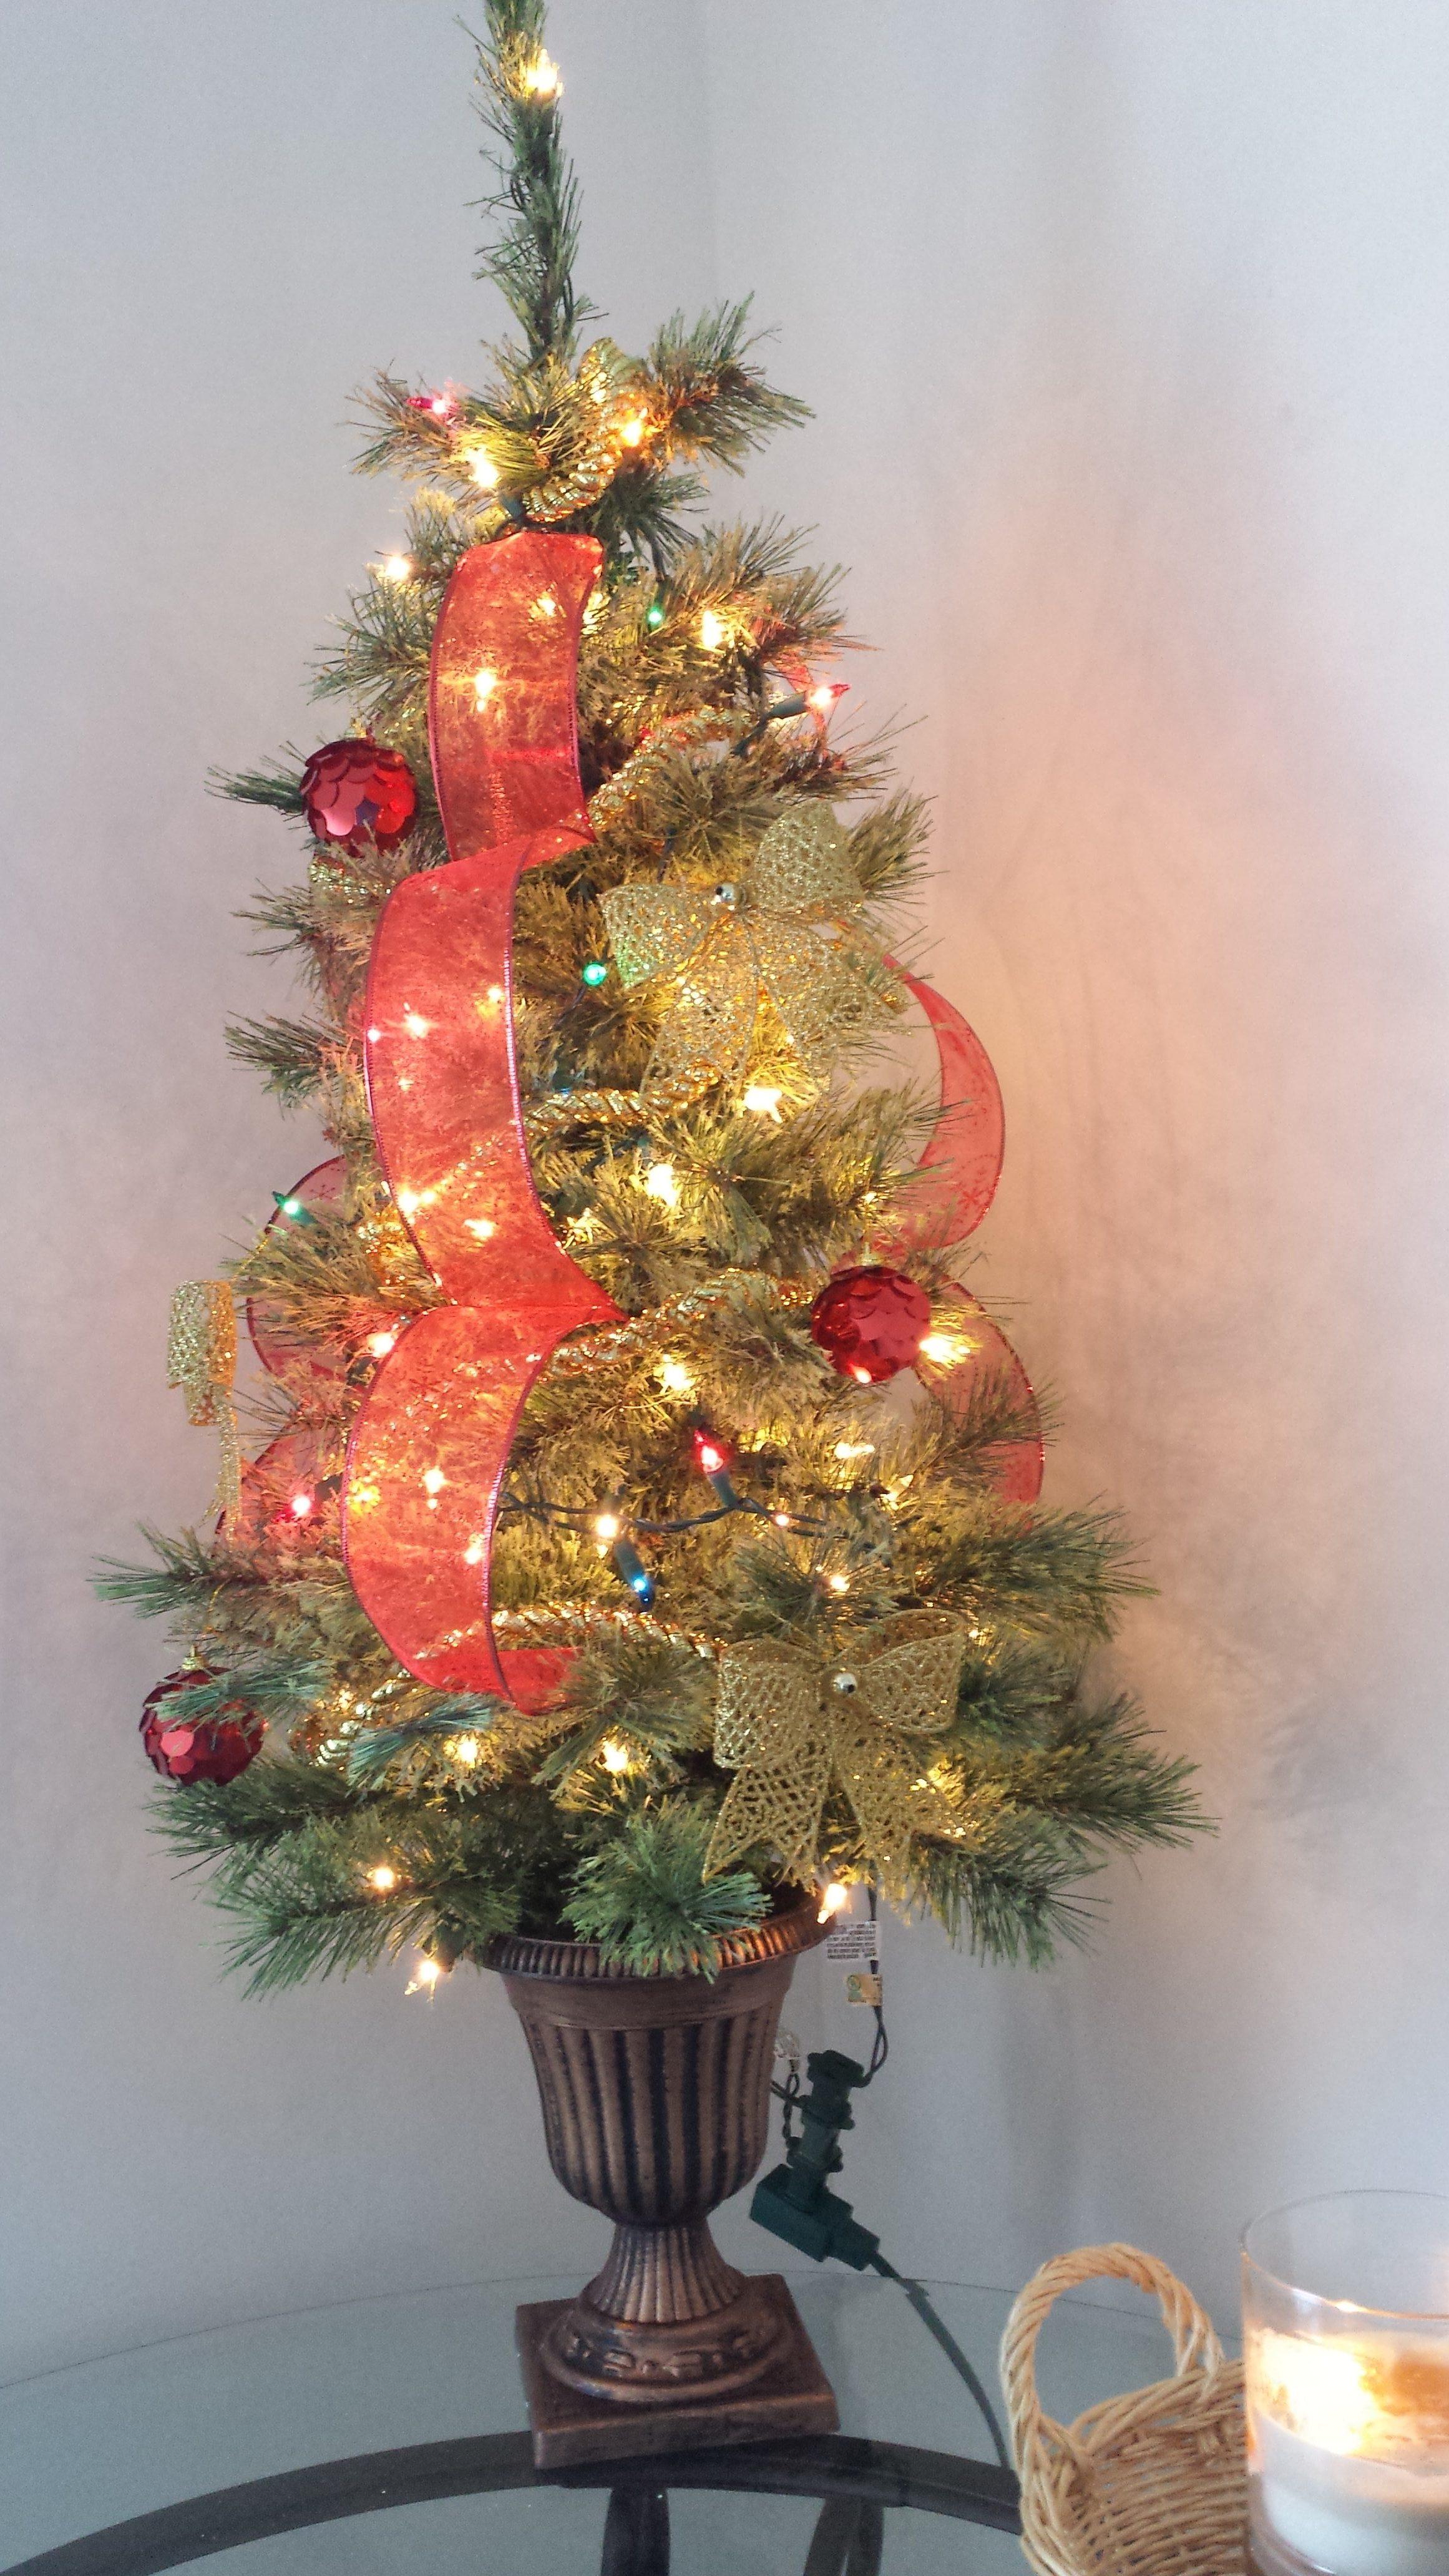 free picture  christmas tree  light  celebration  decoration  tree  lamp